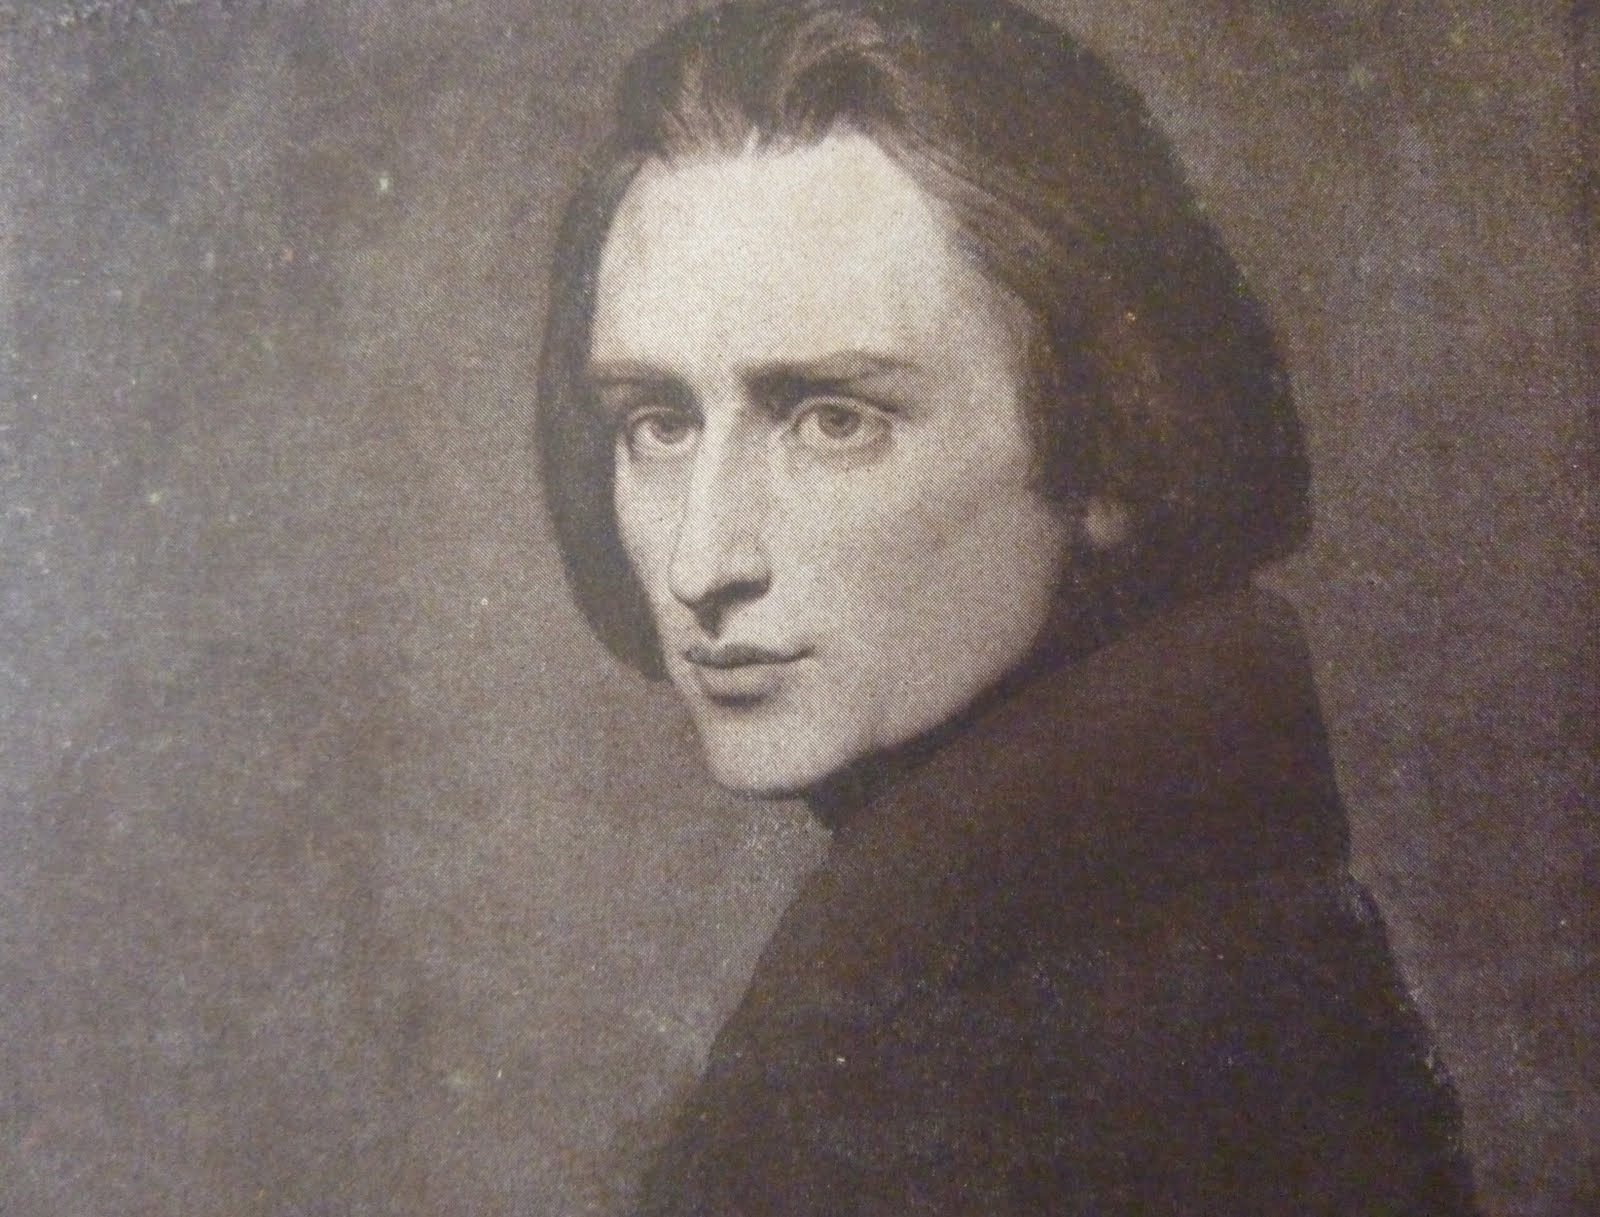 Franz Liszt* Liszt·- Bedřich Smetana* Smetana·- Berliner Philharmoniker - Herbert von Karajan - Les Préludes - Ungarische Rhapsodie Nr. 4 - Vyšehrad - Die Moldau